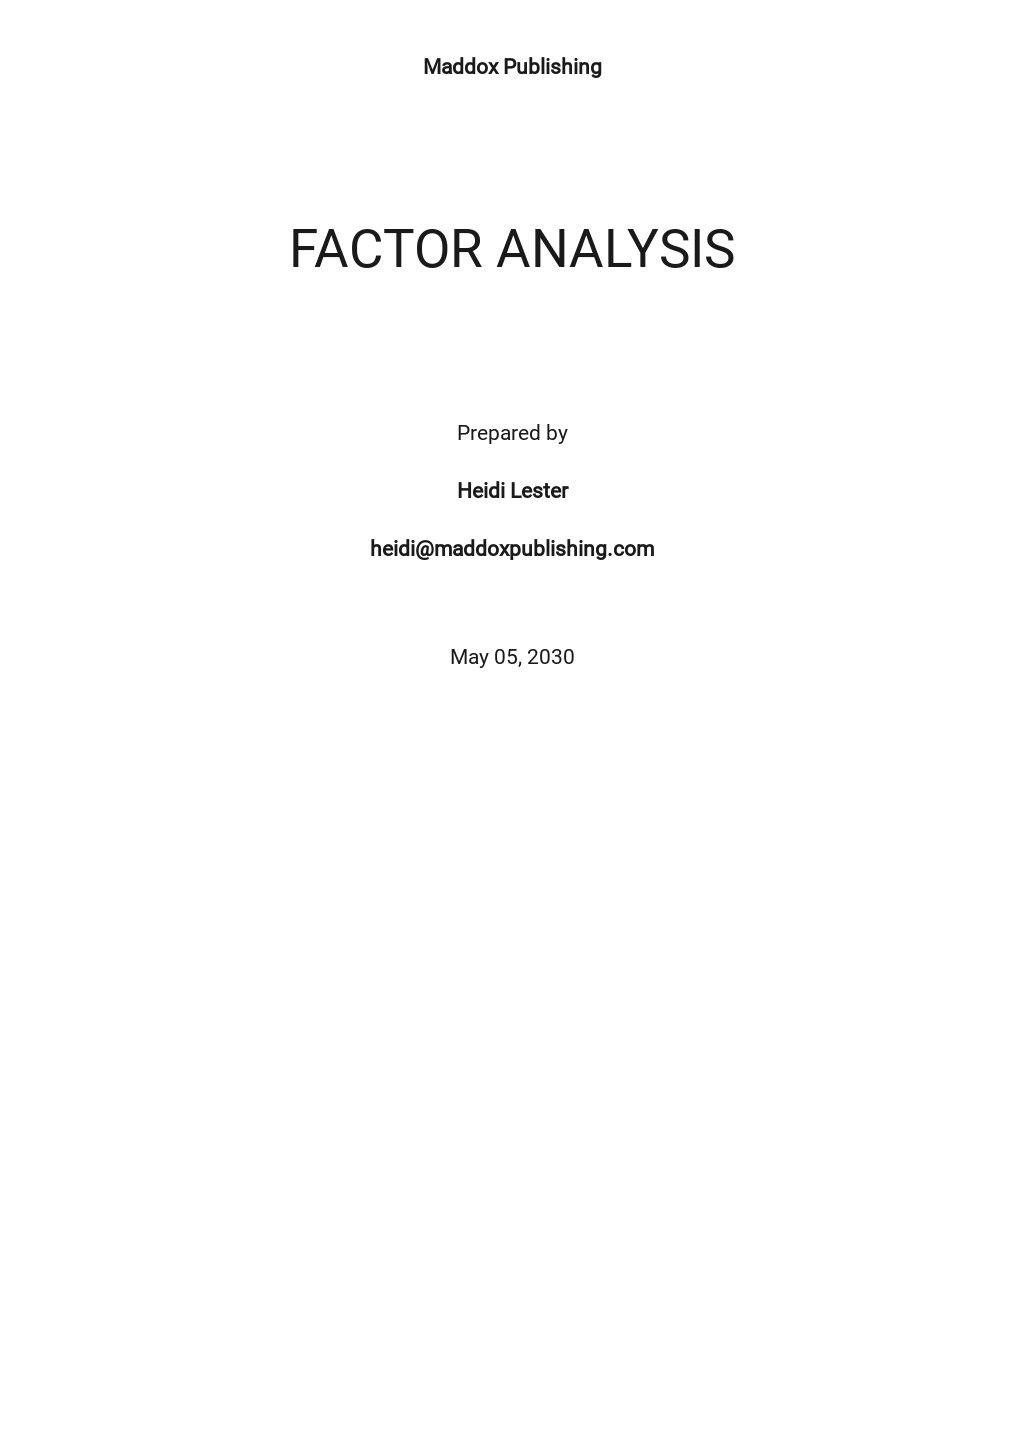 Factor Analysis Template.jpe